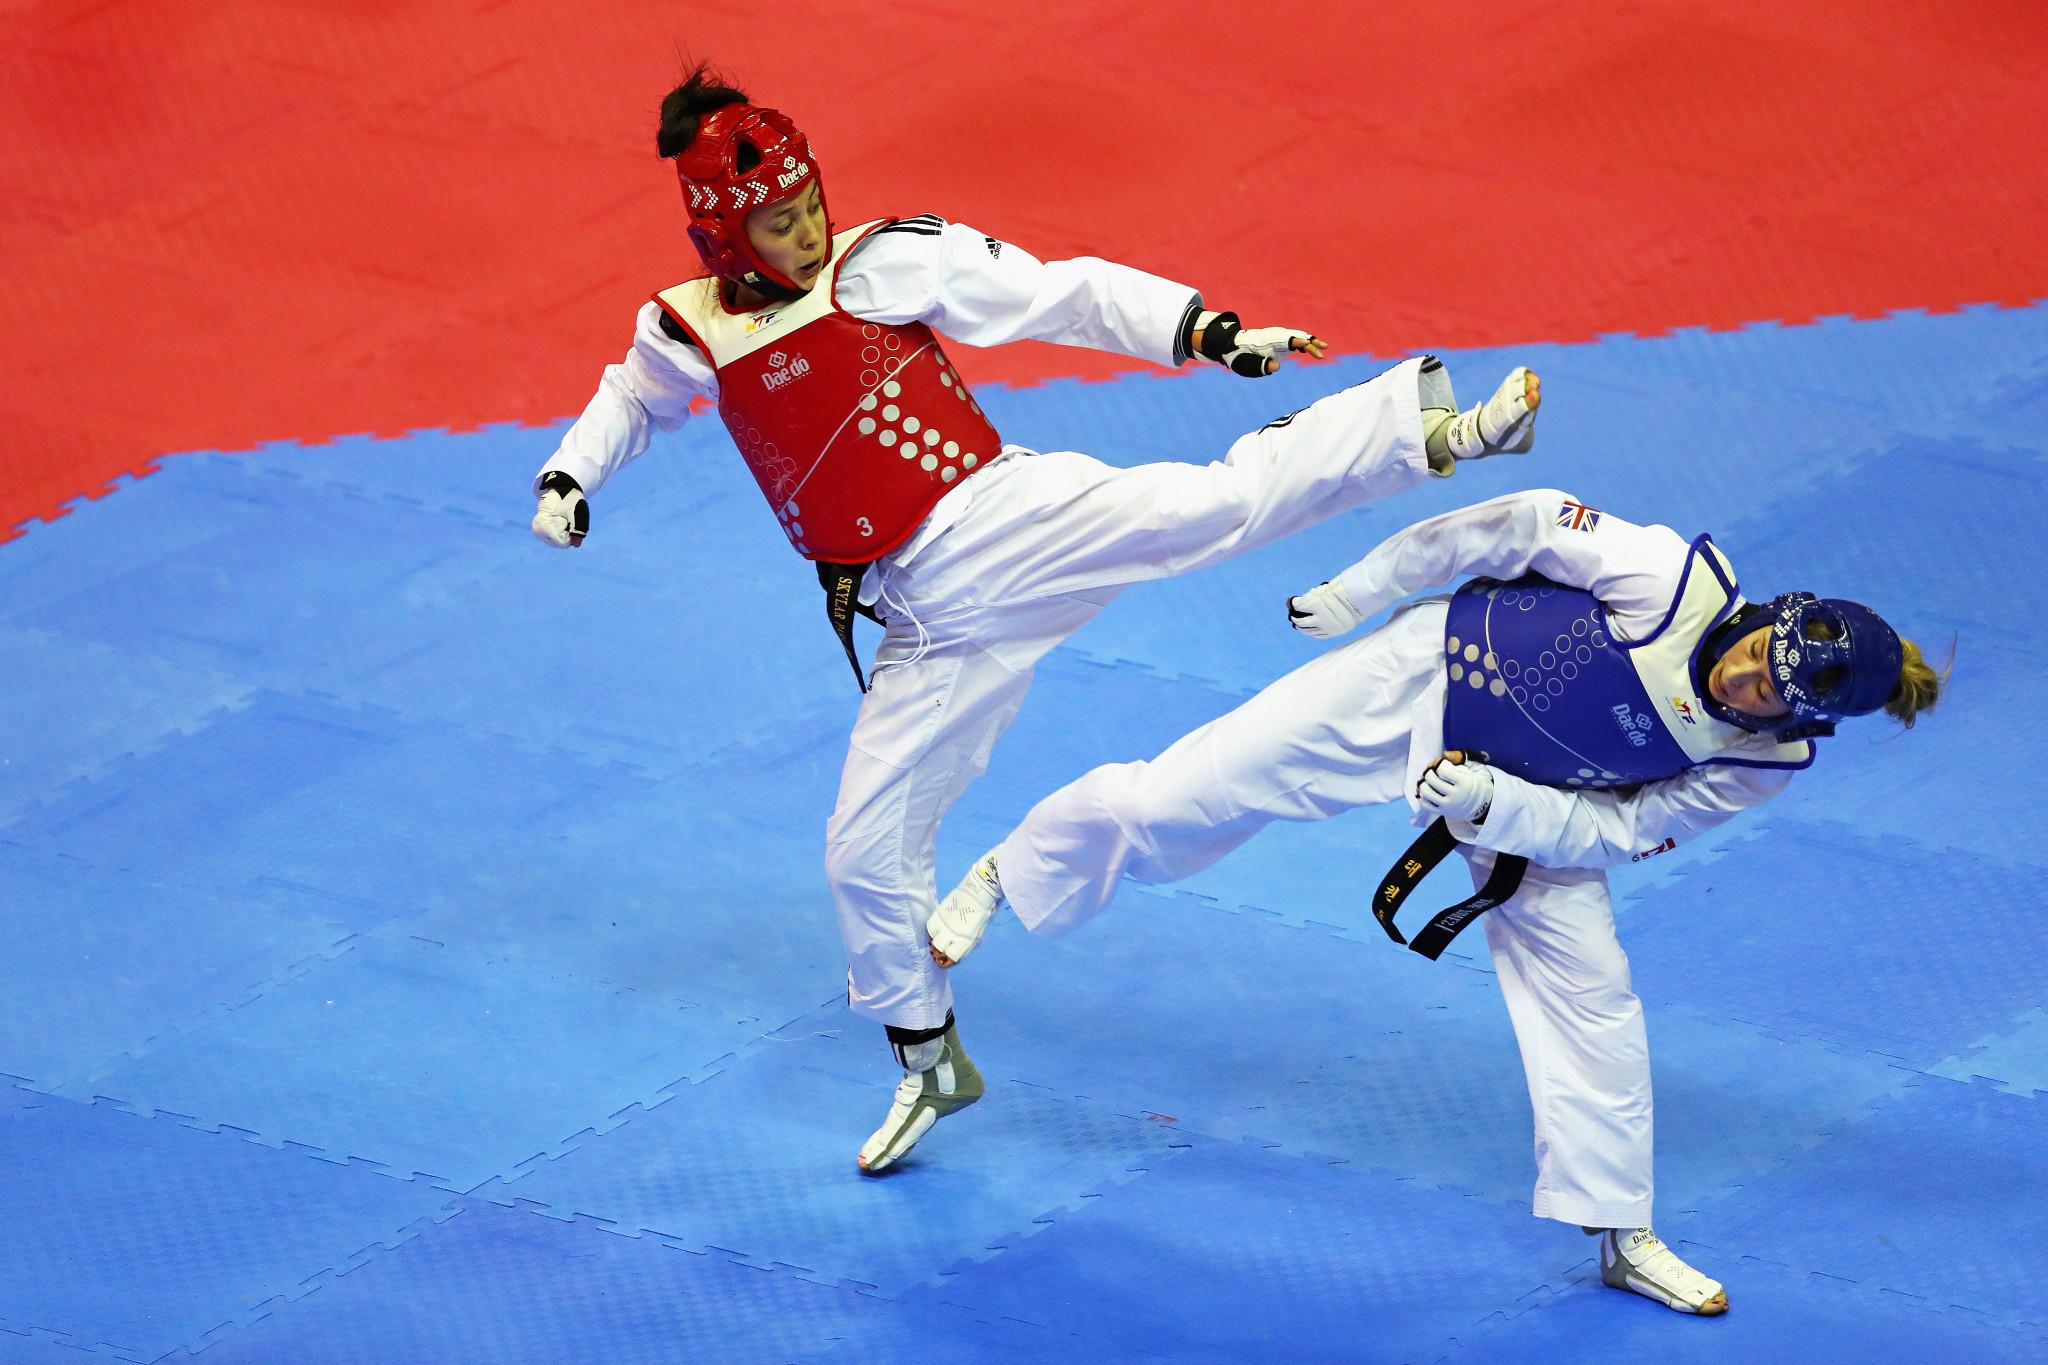 Taekwondo Canada President congratulates Park on Olympic qualification